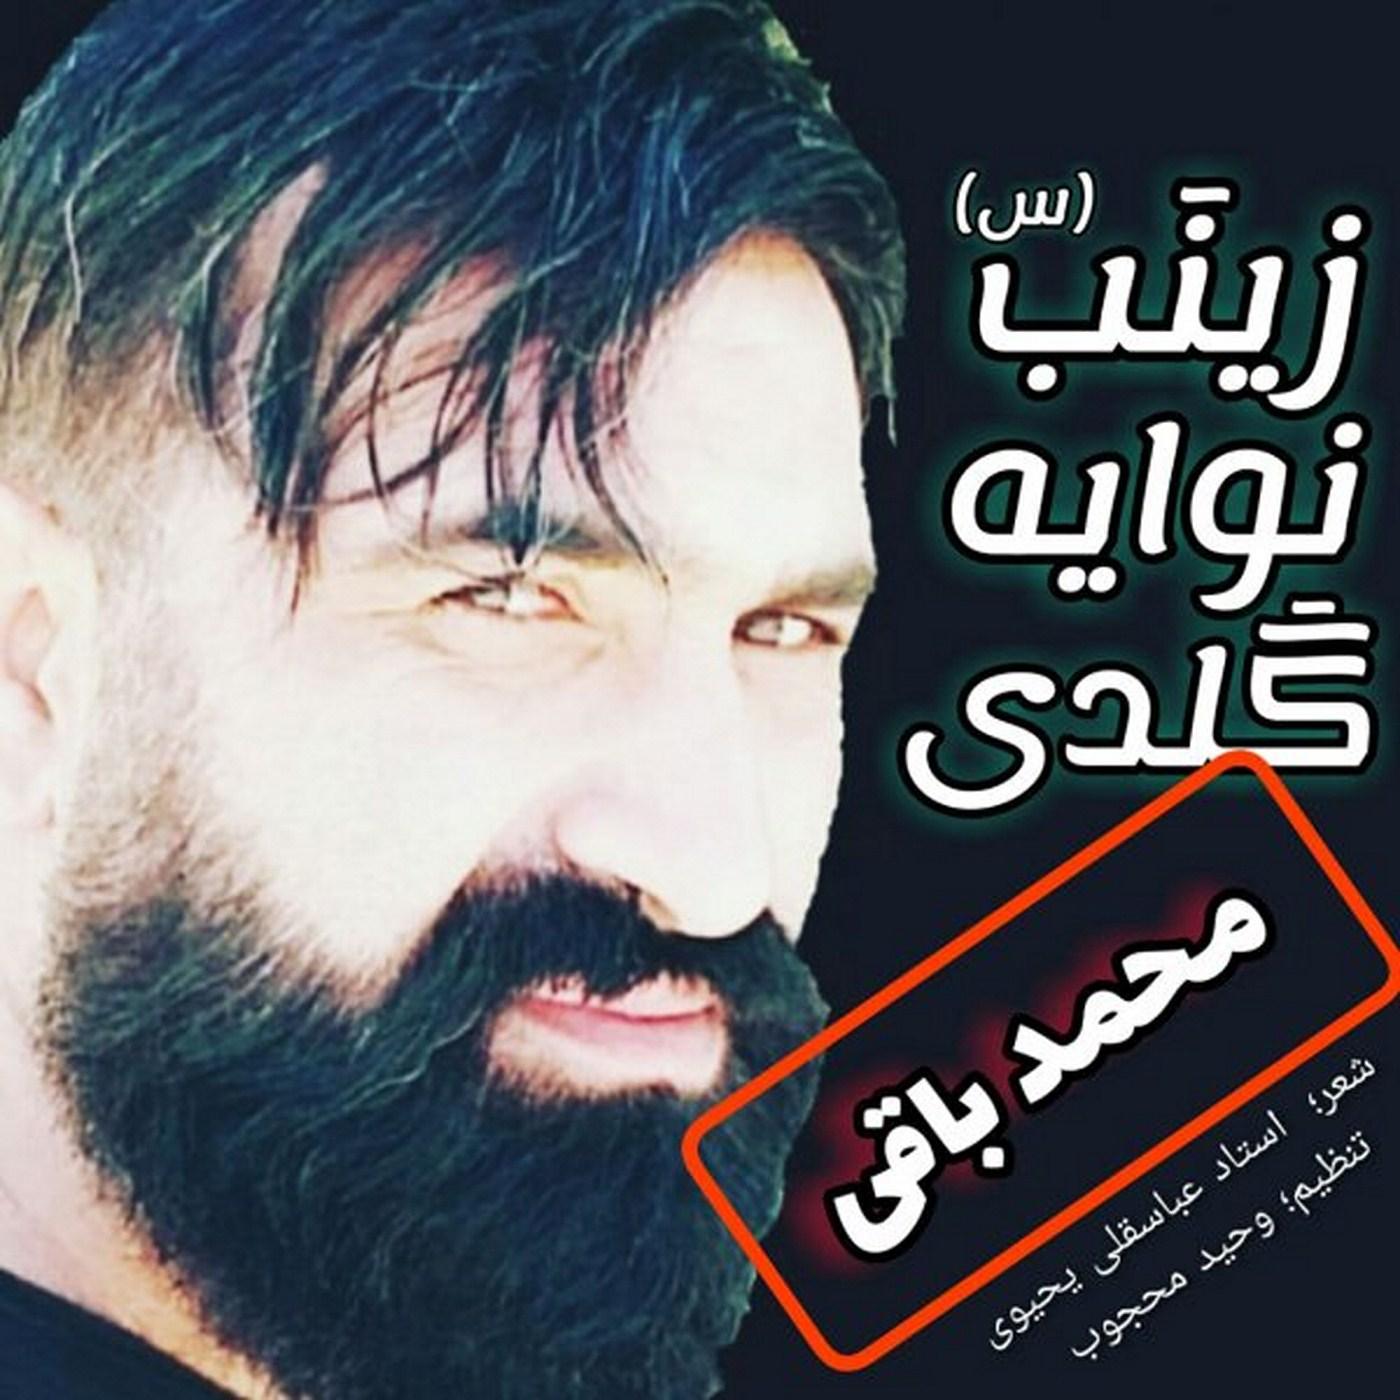 https://s20.picofile.com/file/8441432018/09Mohammad_Baghi_Zeynab_Navaya_Galdi.jpg